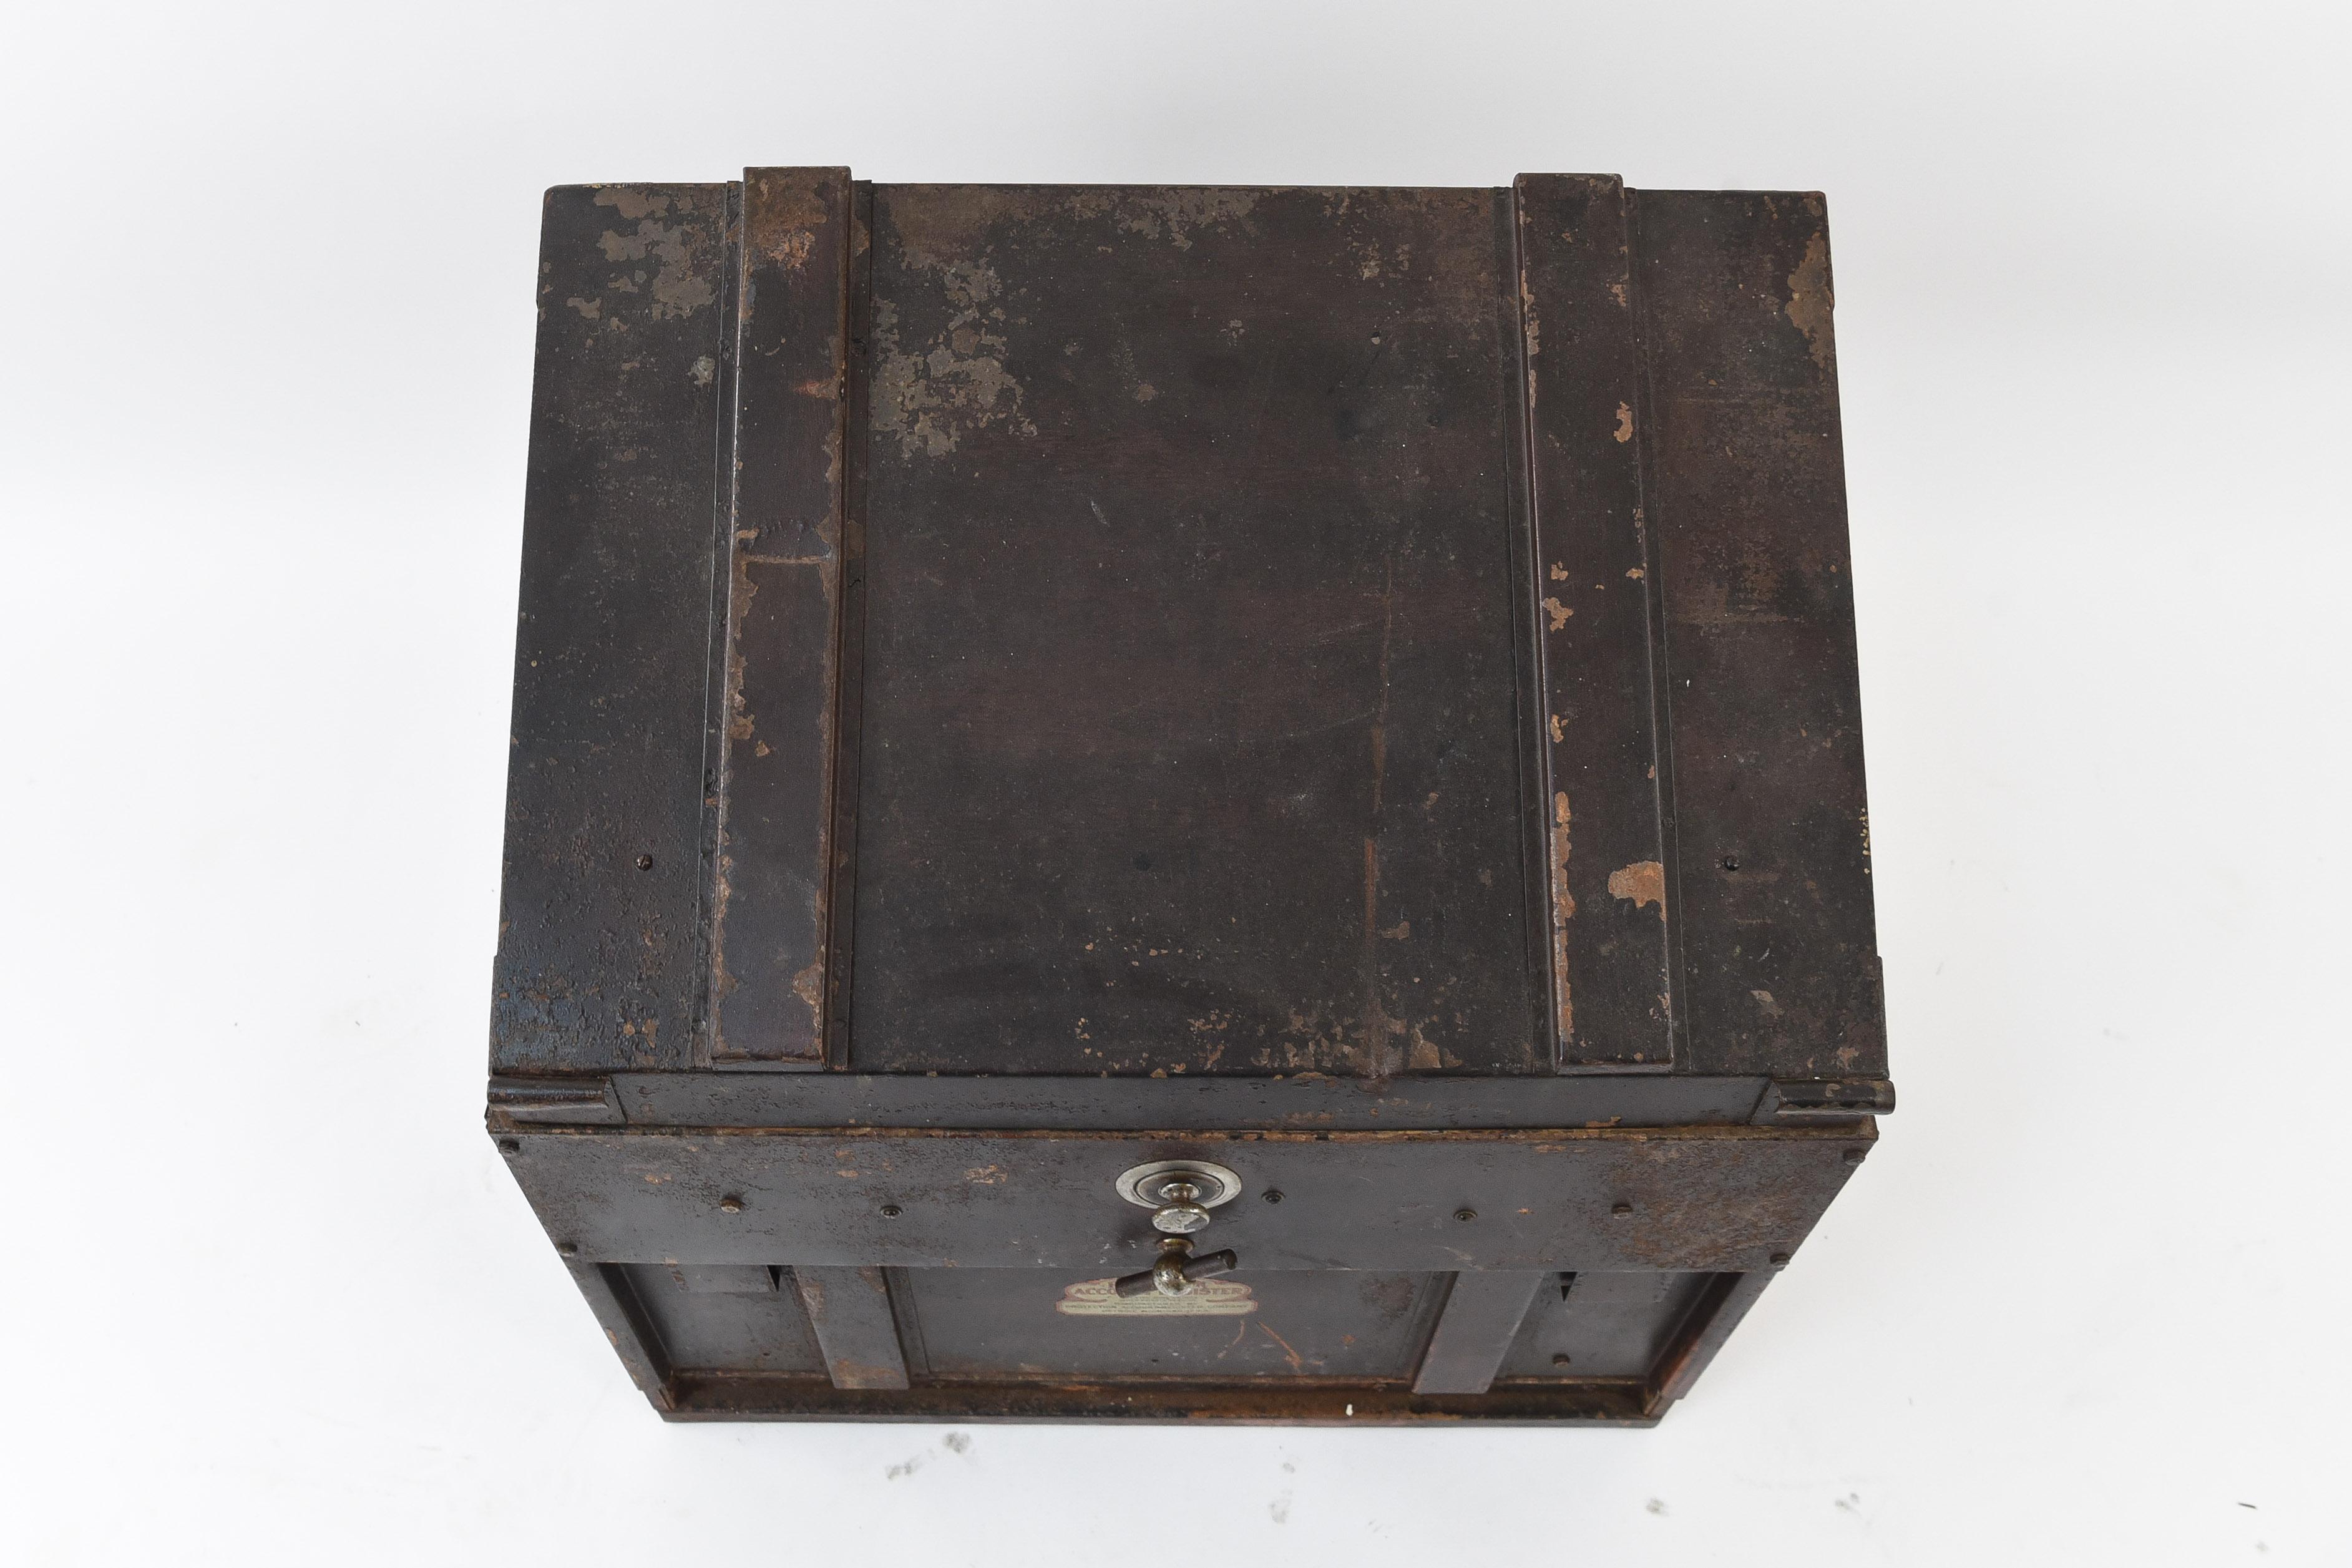 Vintage industrial Account Register filing cabinet & Vintage industrial Account Register filing cabinet - West Port Auction